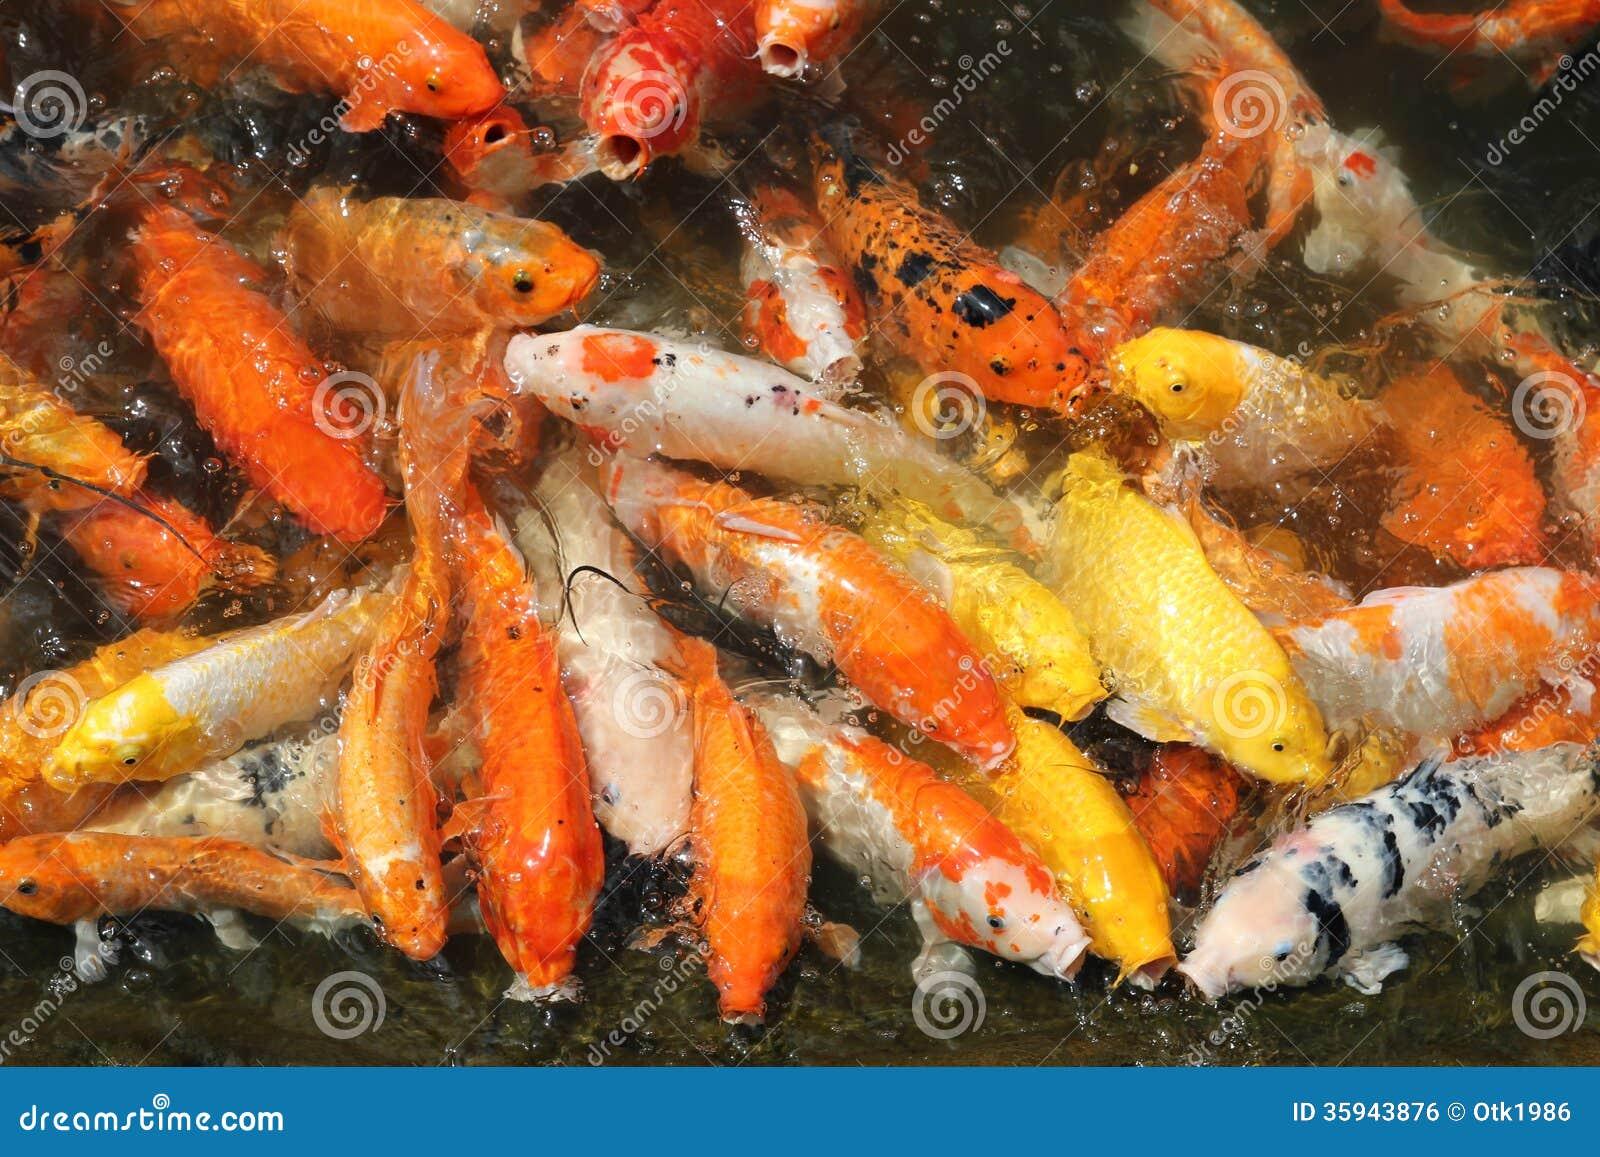 Carp koi royalty free stock image image 35943876 for Fraie carpe koi